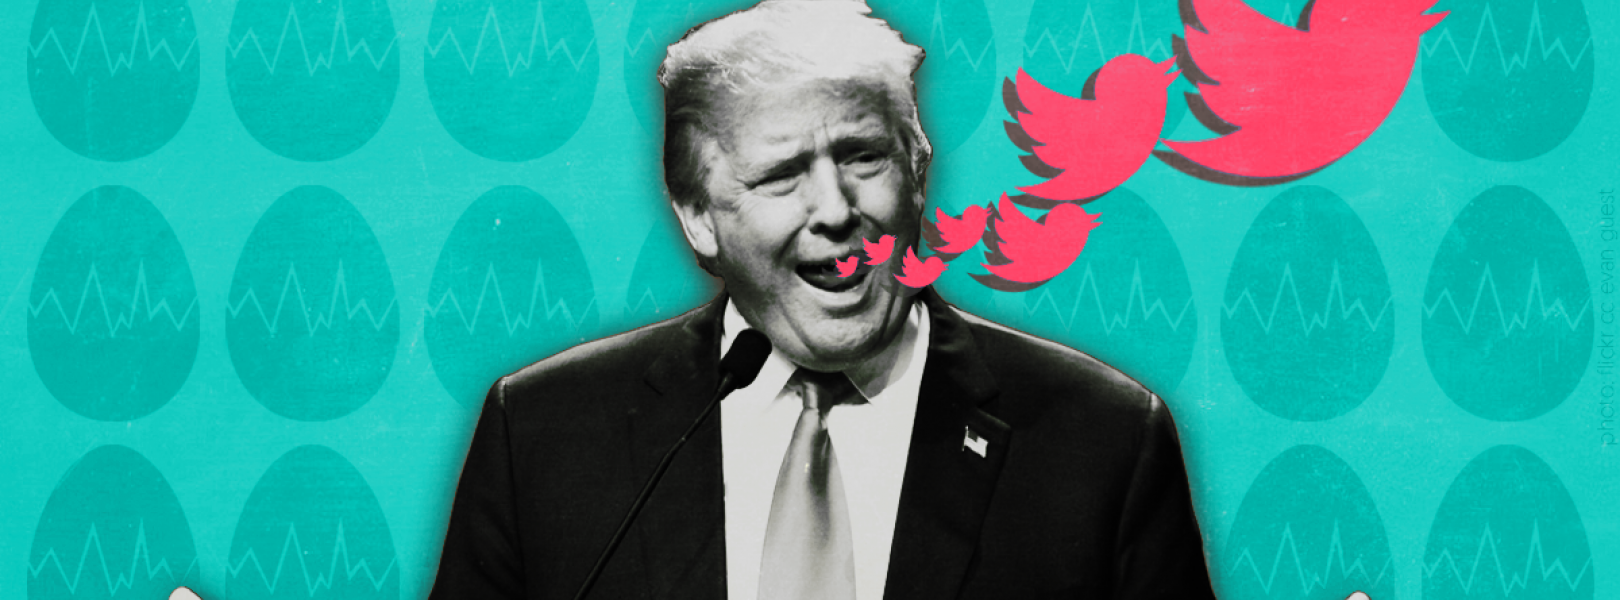 trump-twitter-8.png